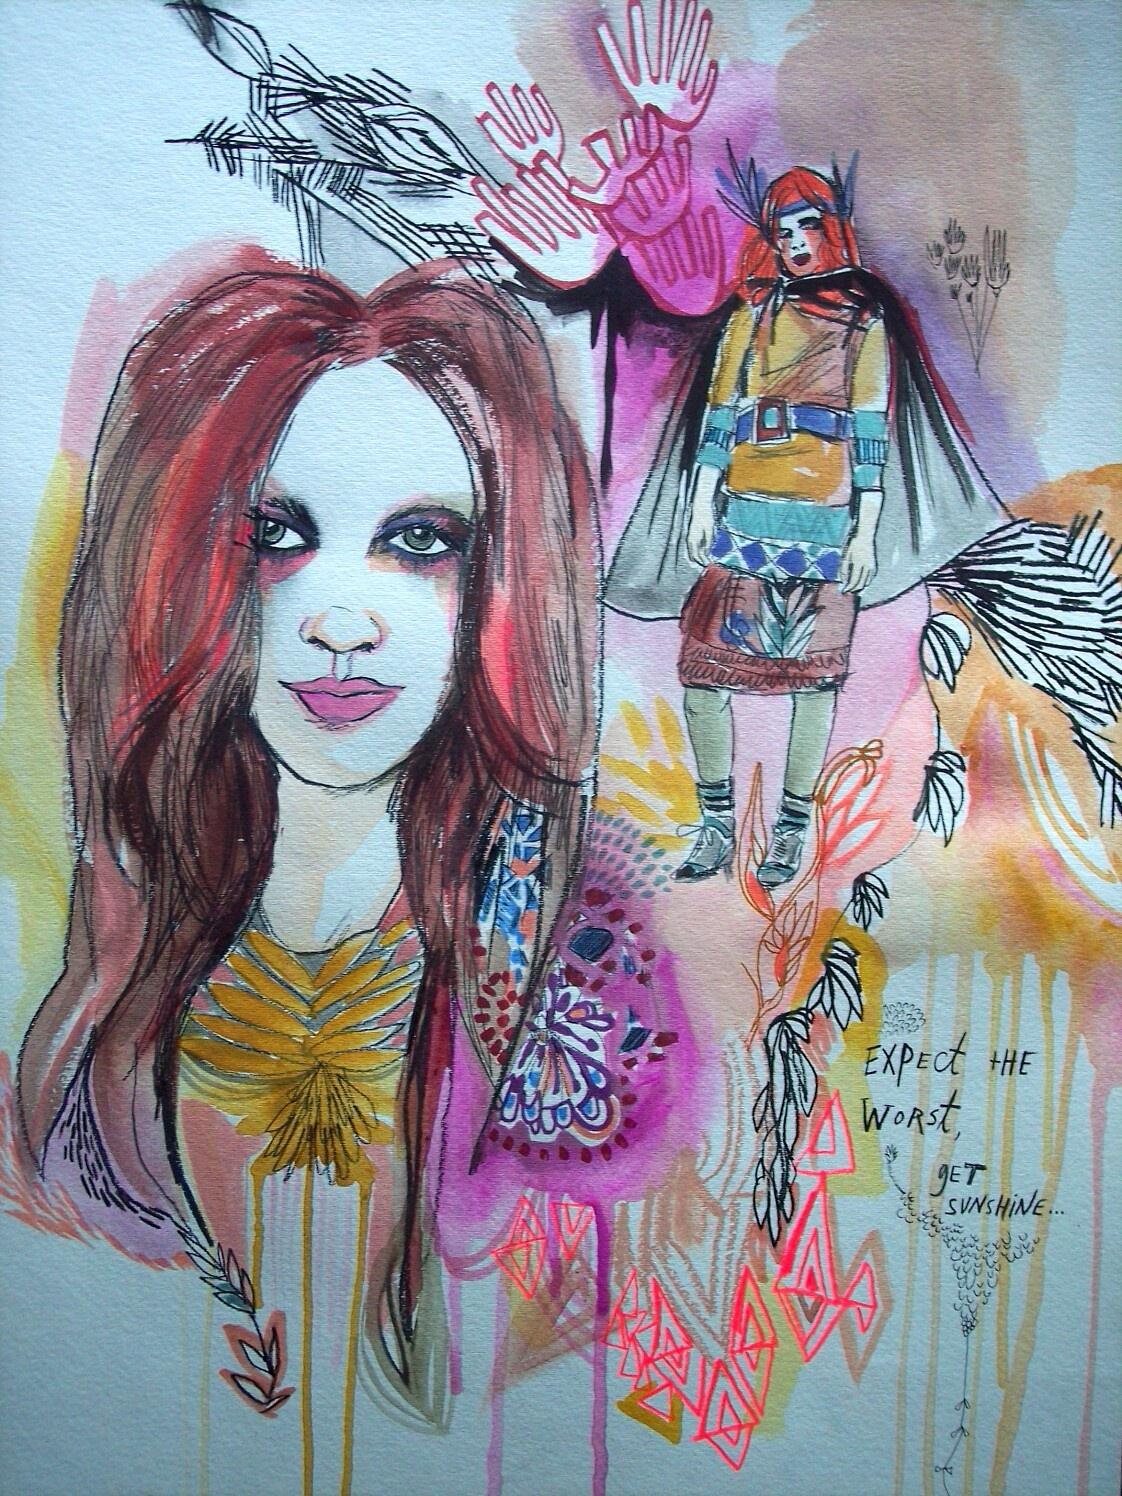 lemonade money uk womenswear fashion buyer amp blogger